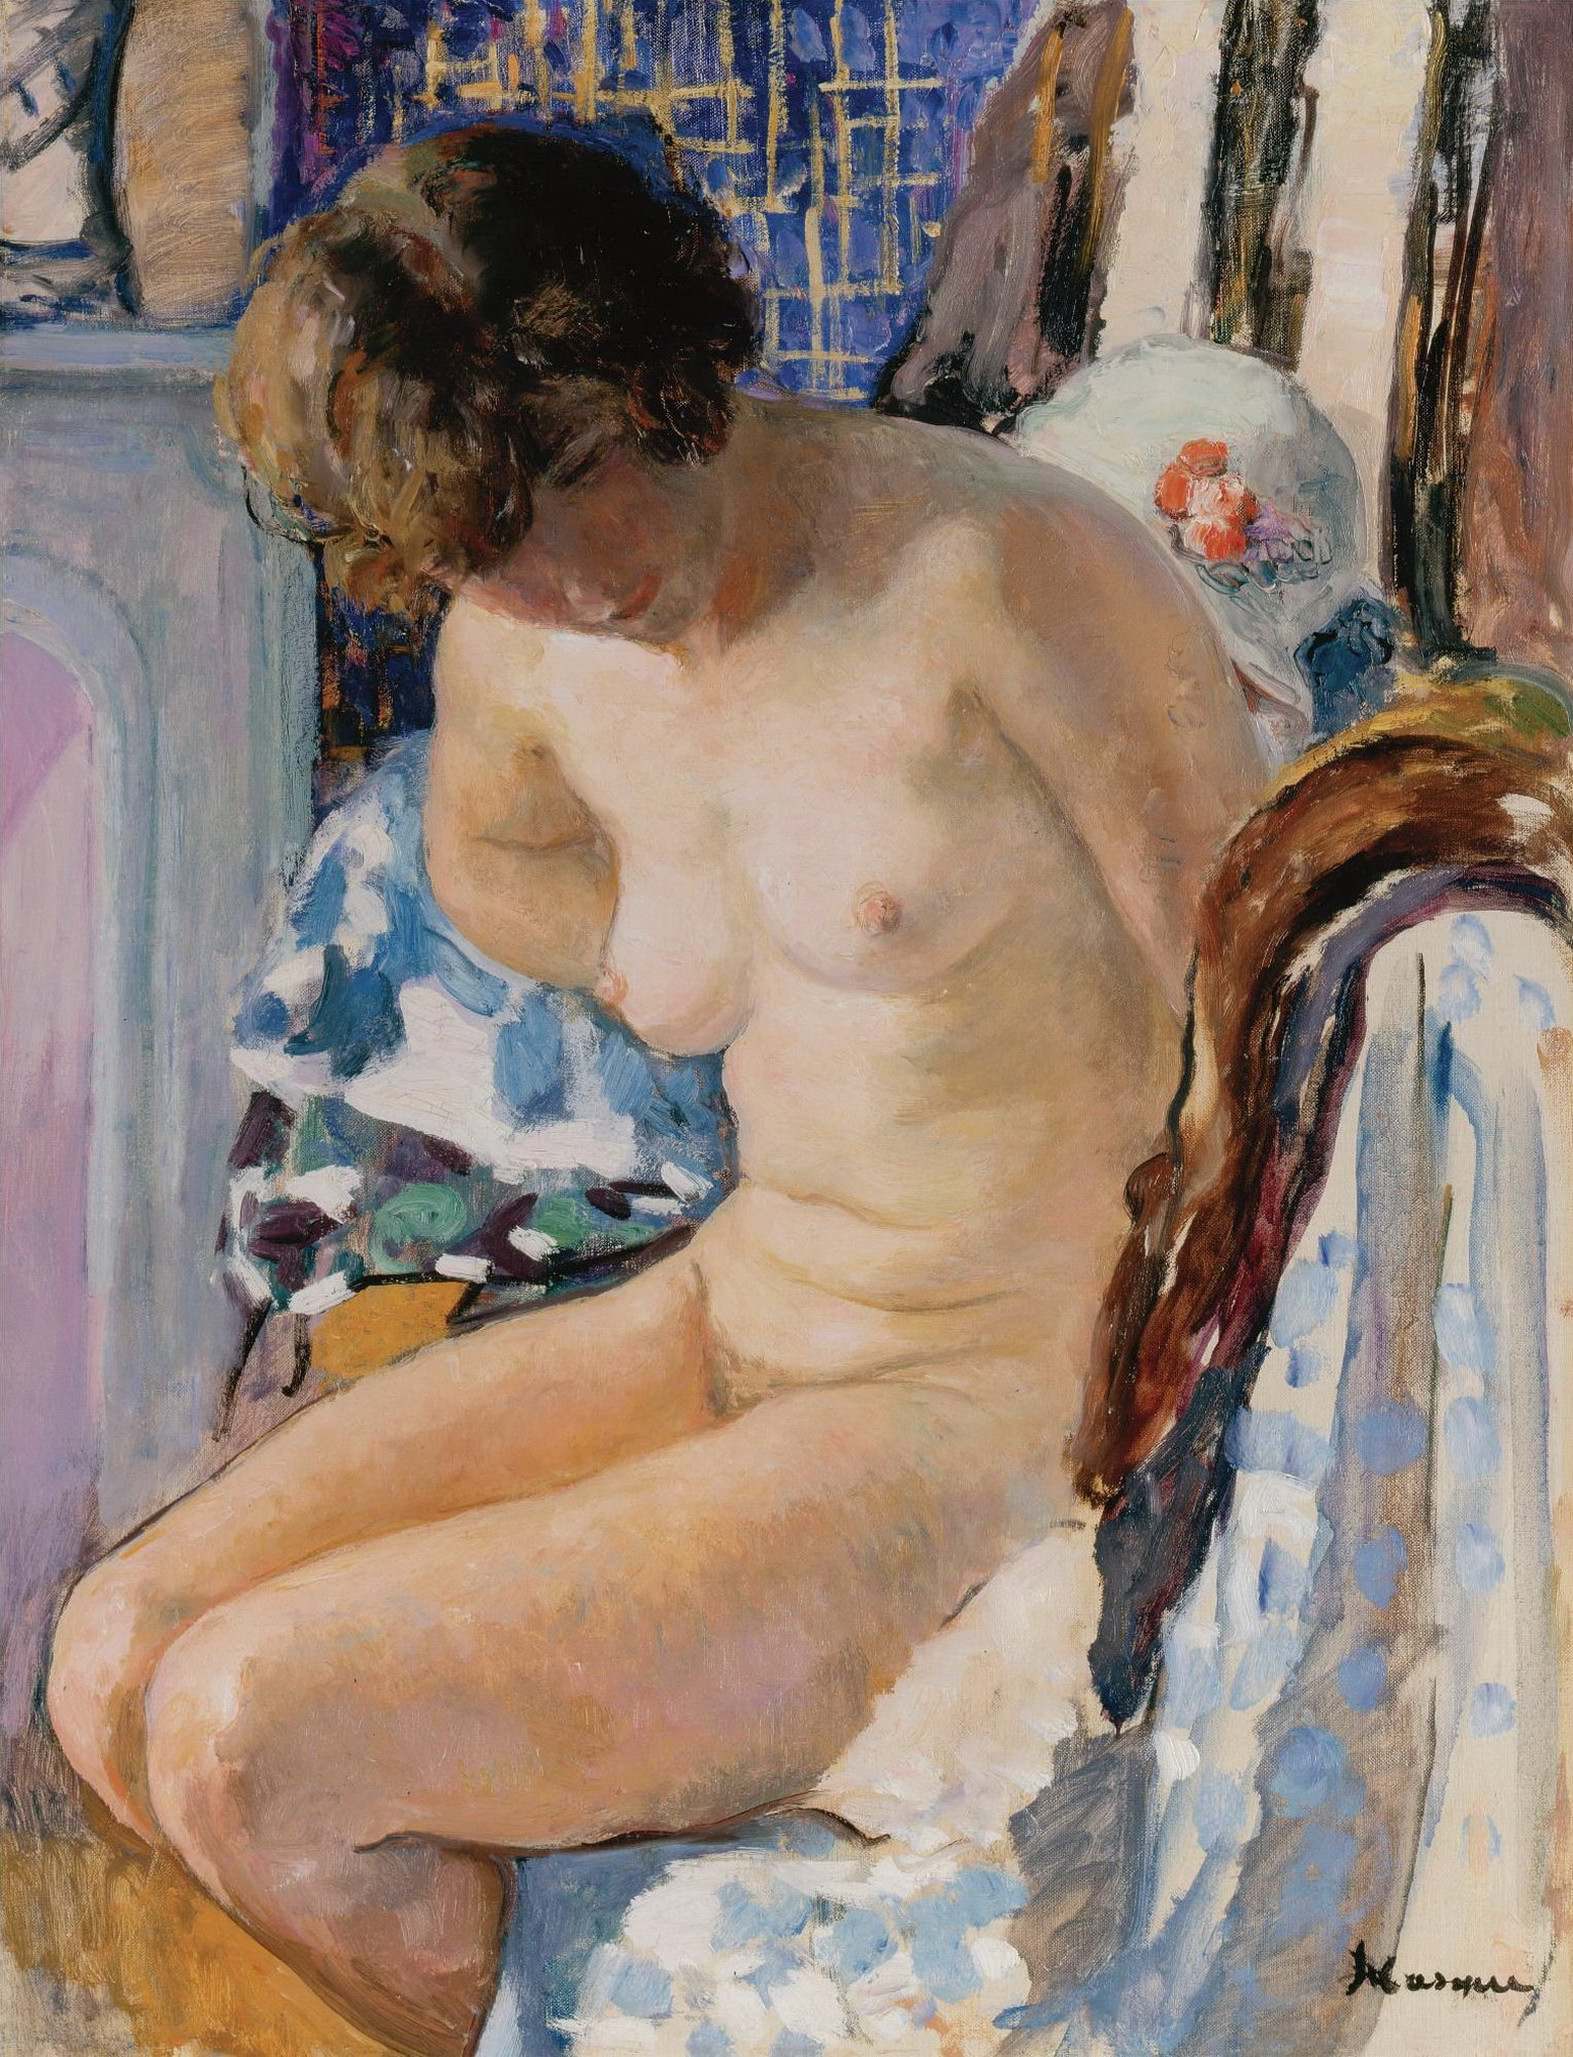 Henri Lebasque, 1865-1937. Сидящая обнаженная-2. Частная коллекция